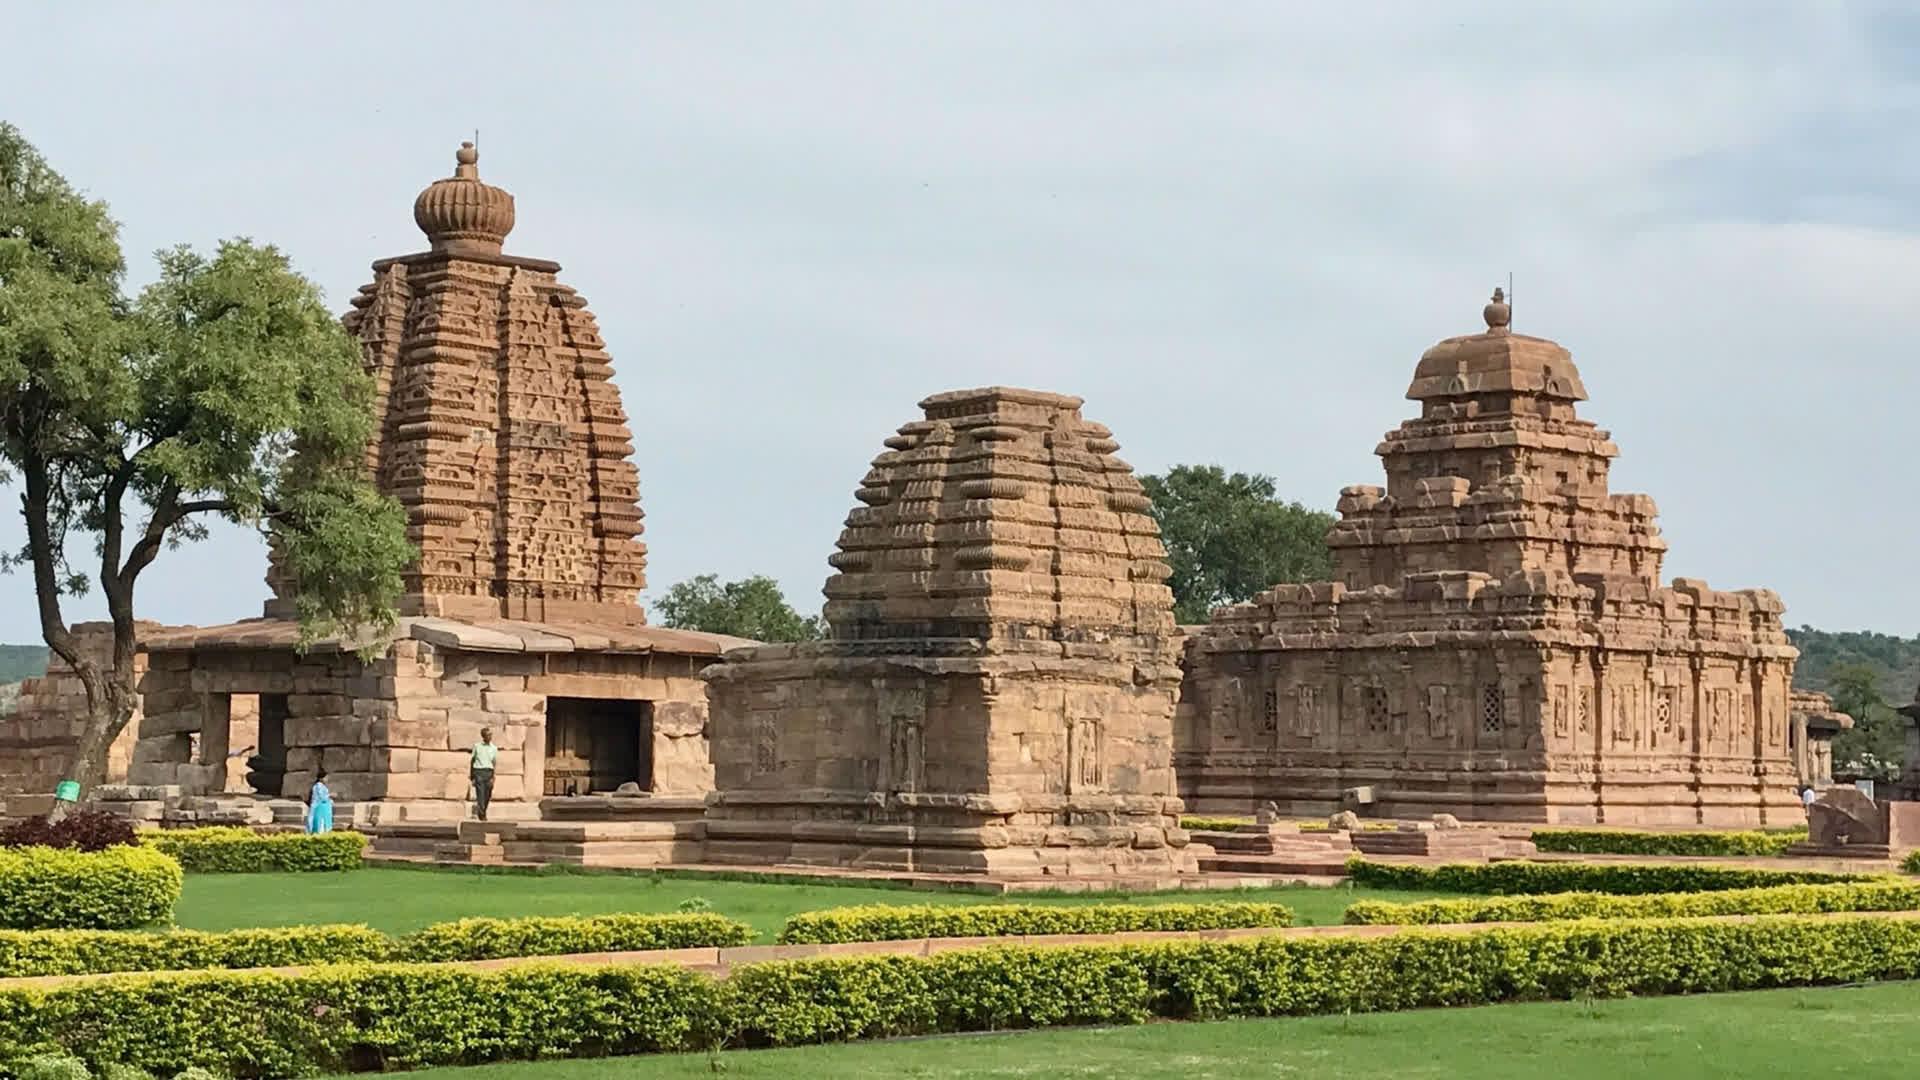 Pattadakal: Cradle of Architecture